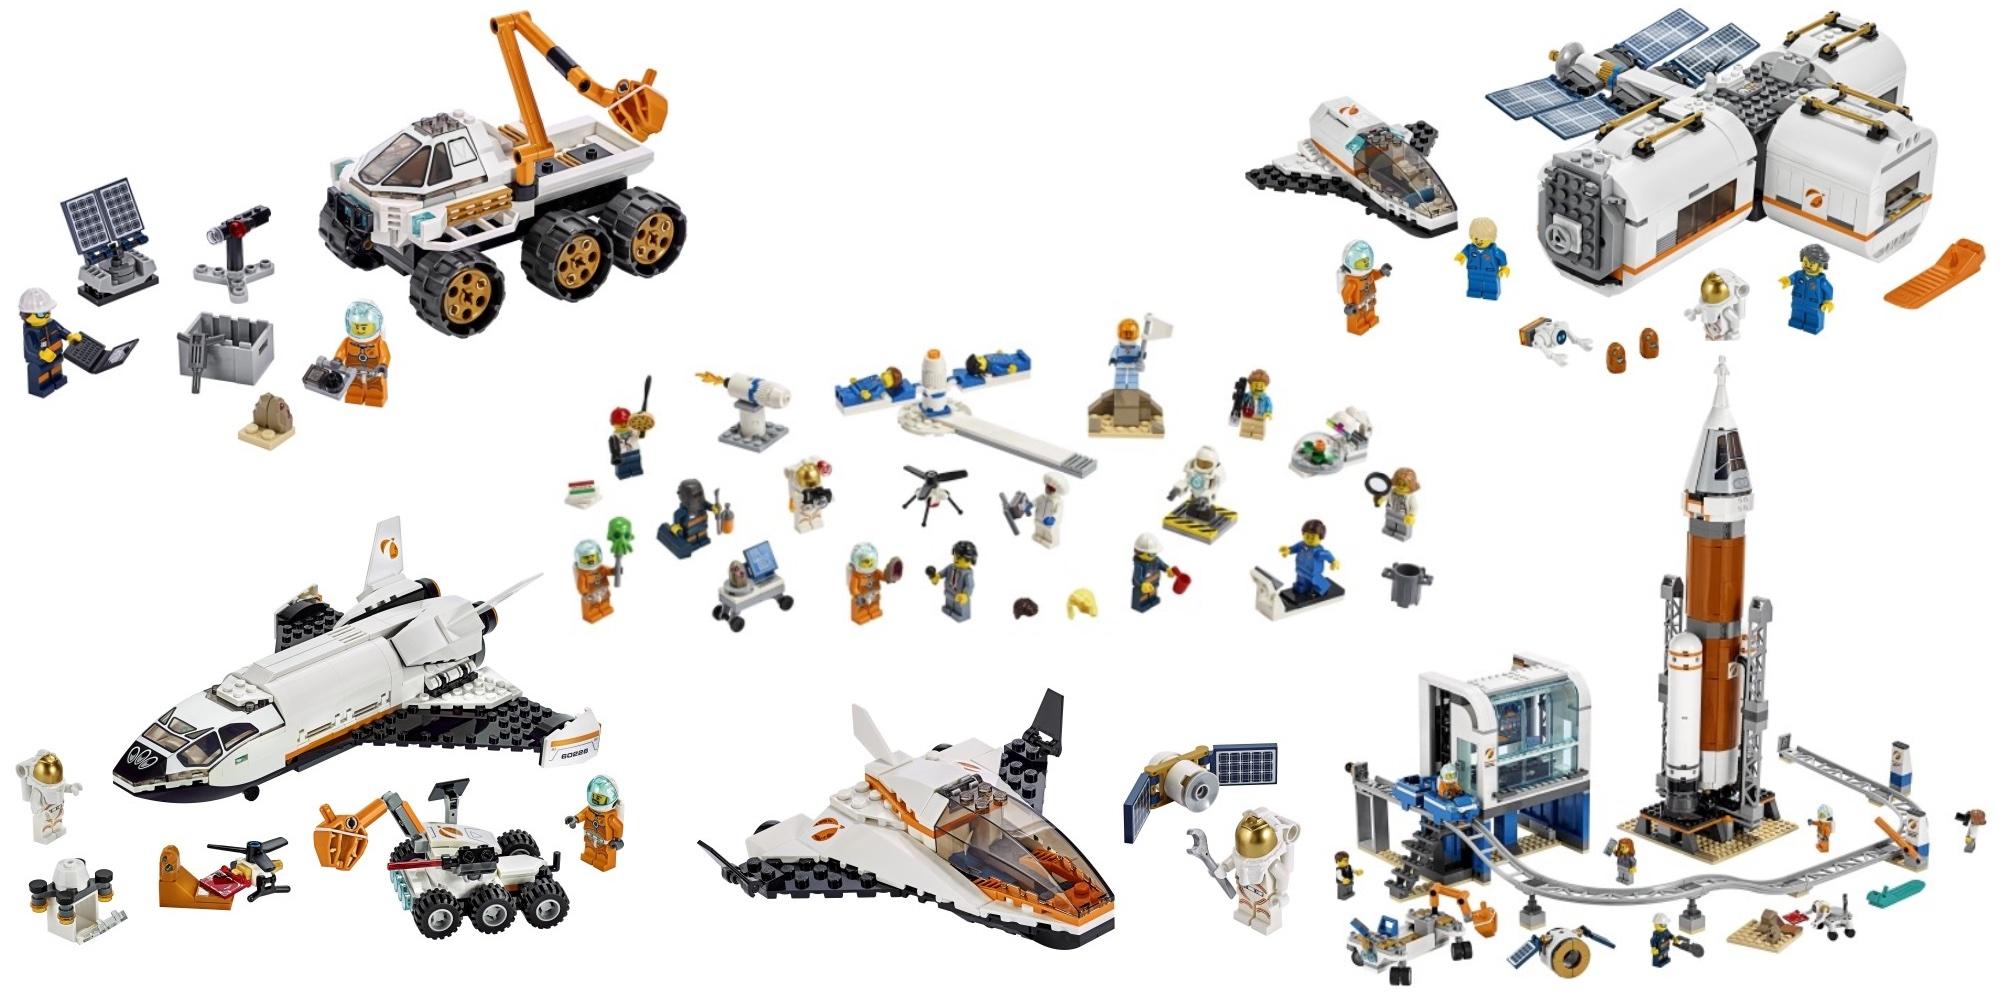 LEGO City Space Sets